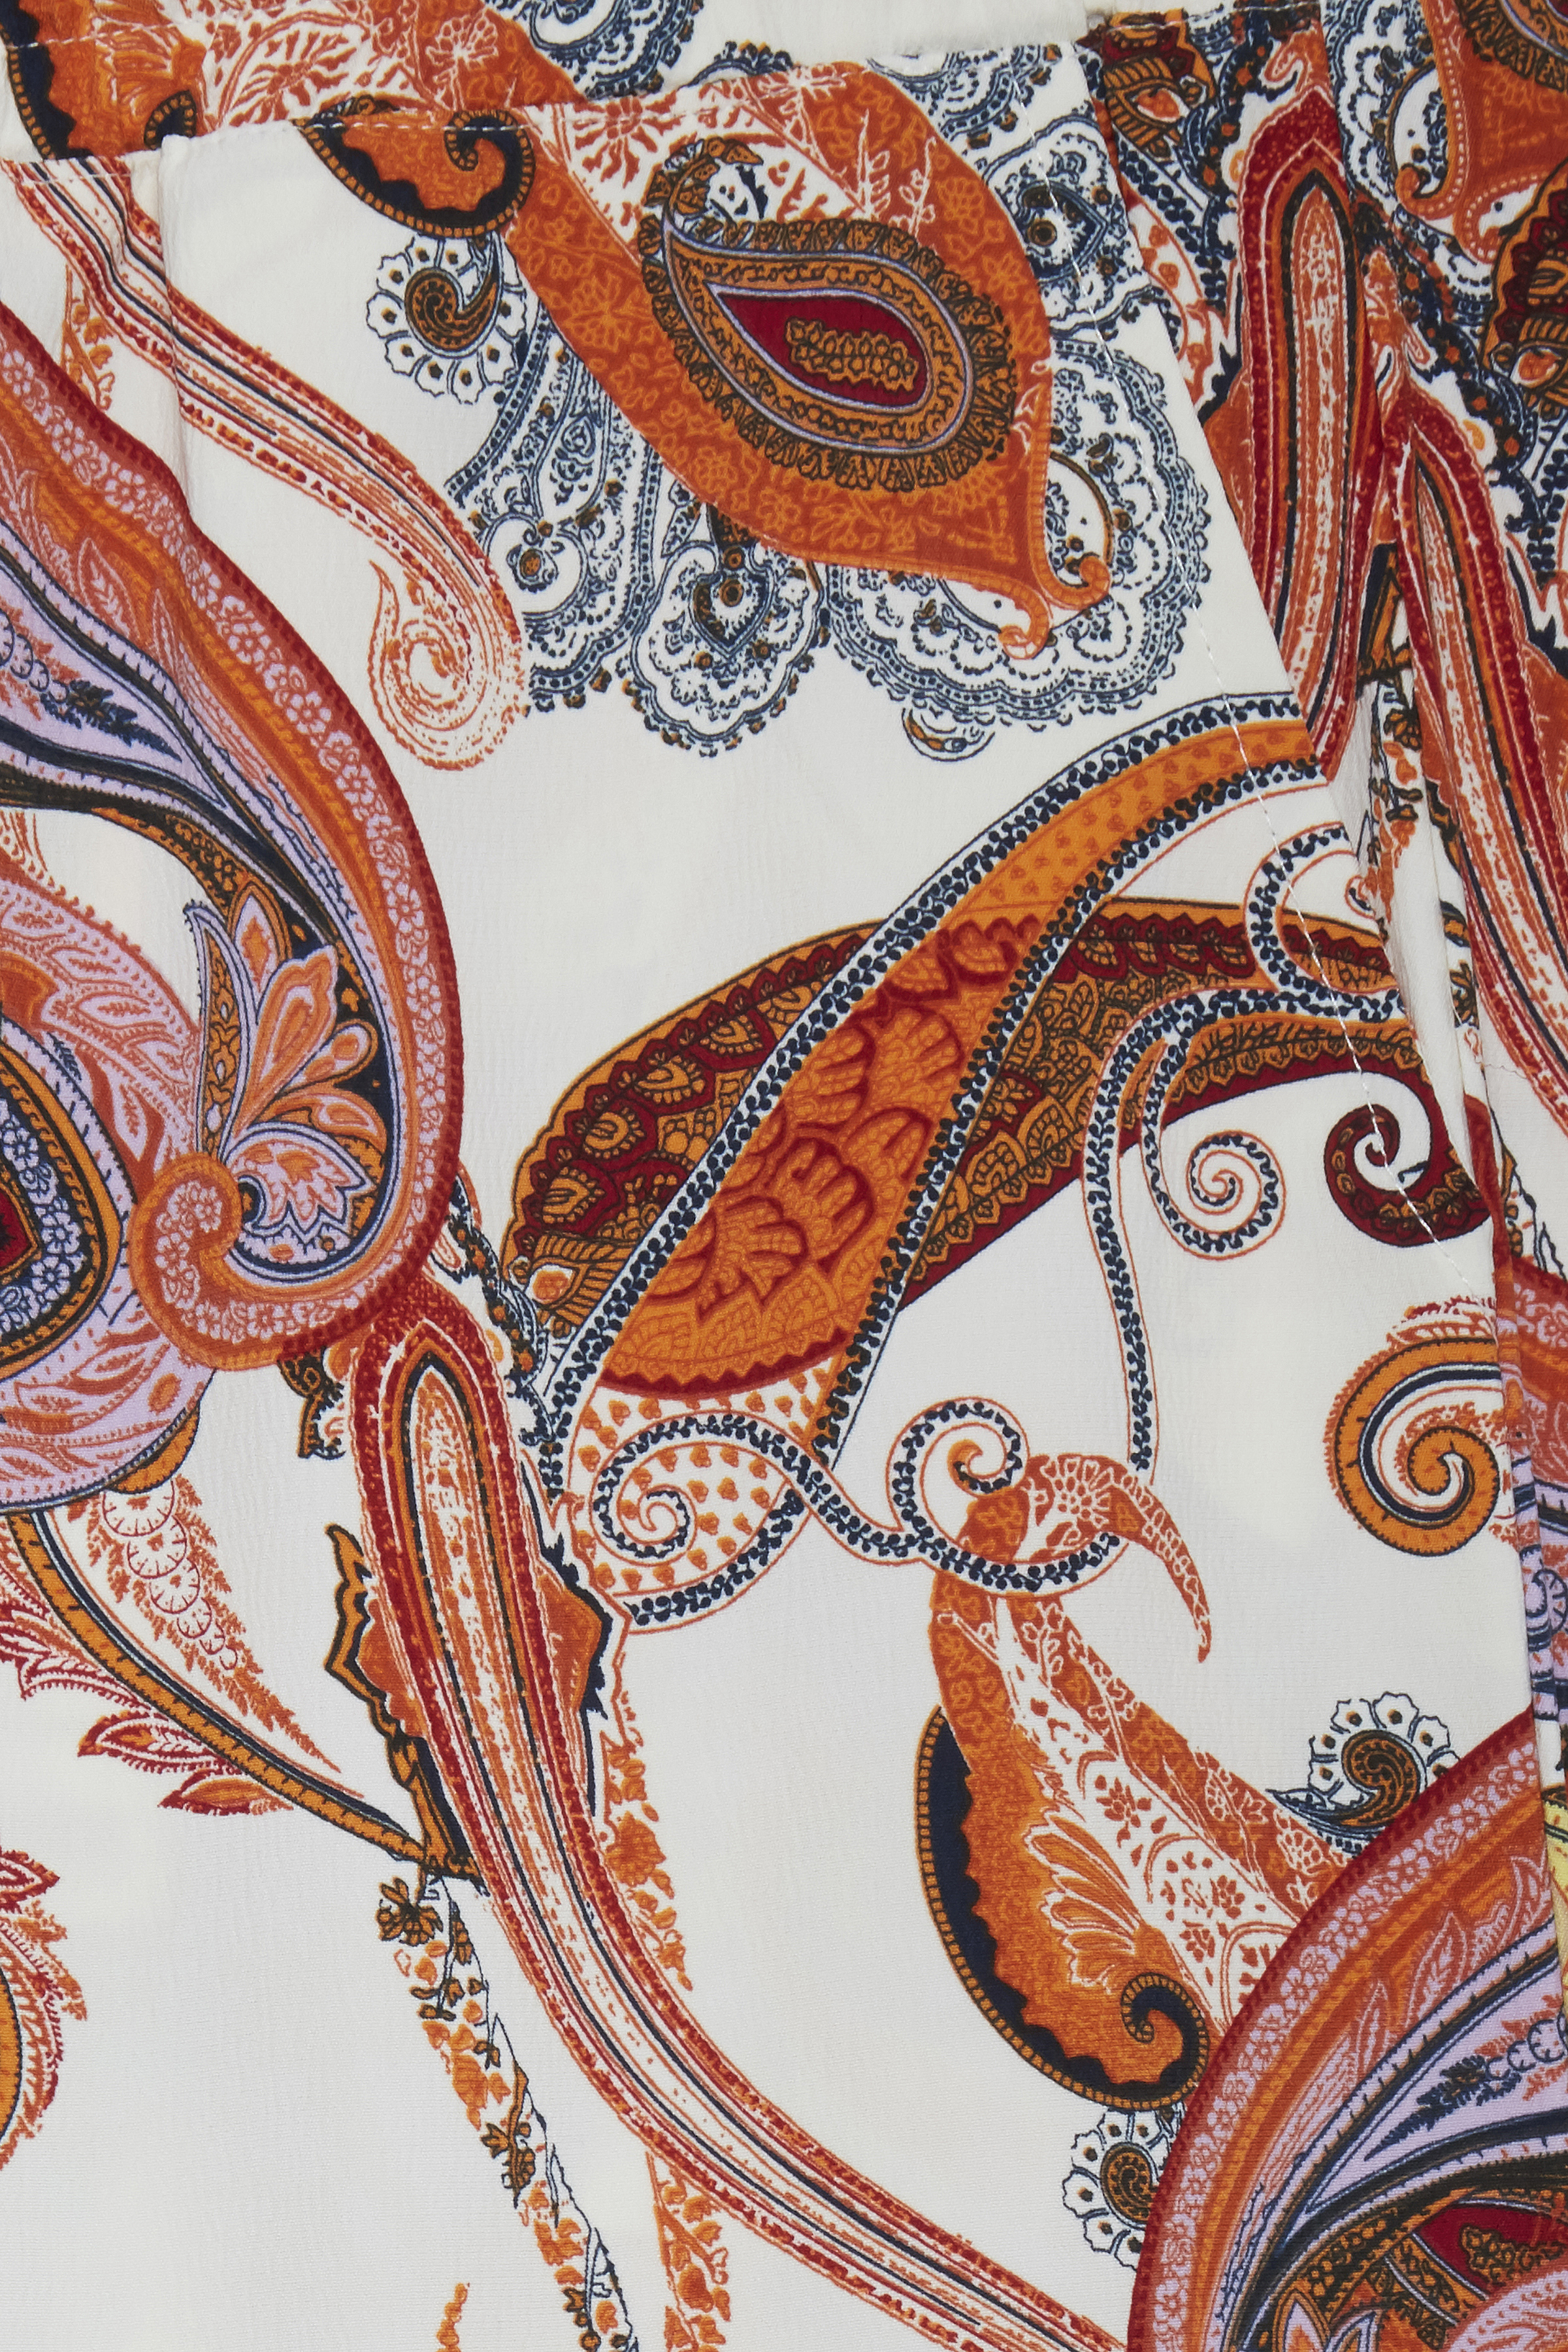 Paprika Combi Pants Casual fra b.young – Køb Paprika Combi Pants Casual fra str. 34-44 her